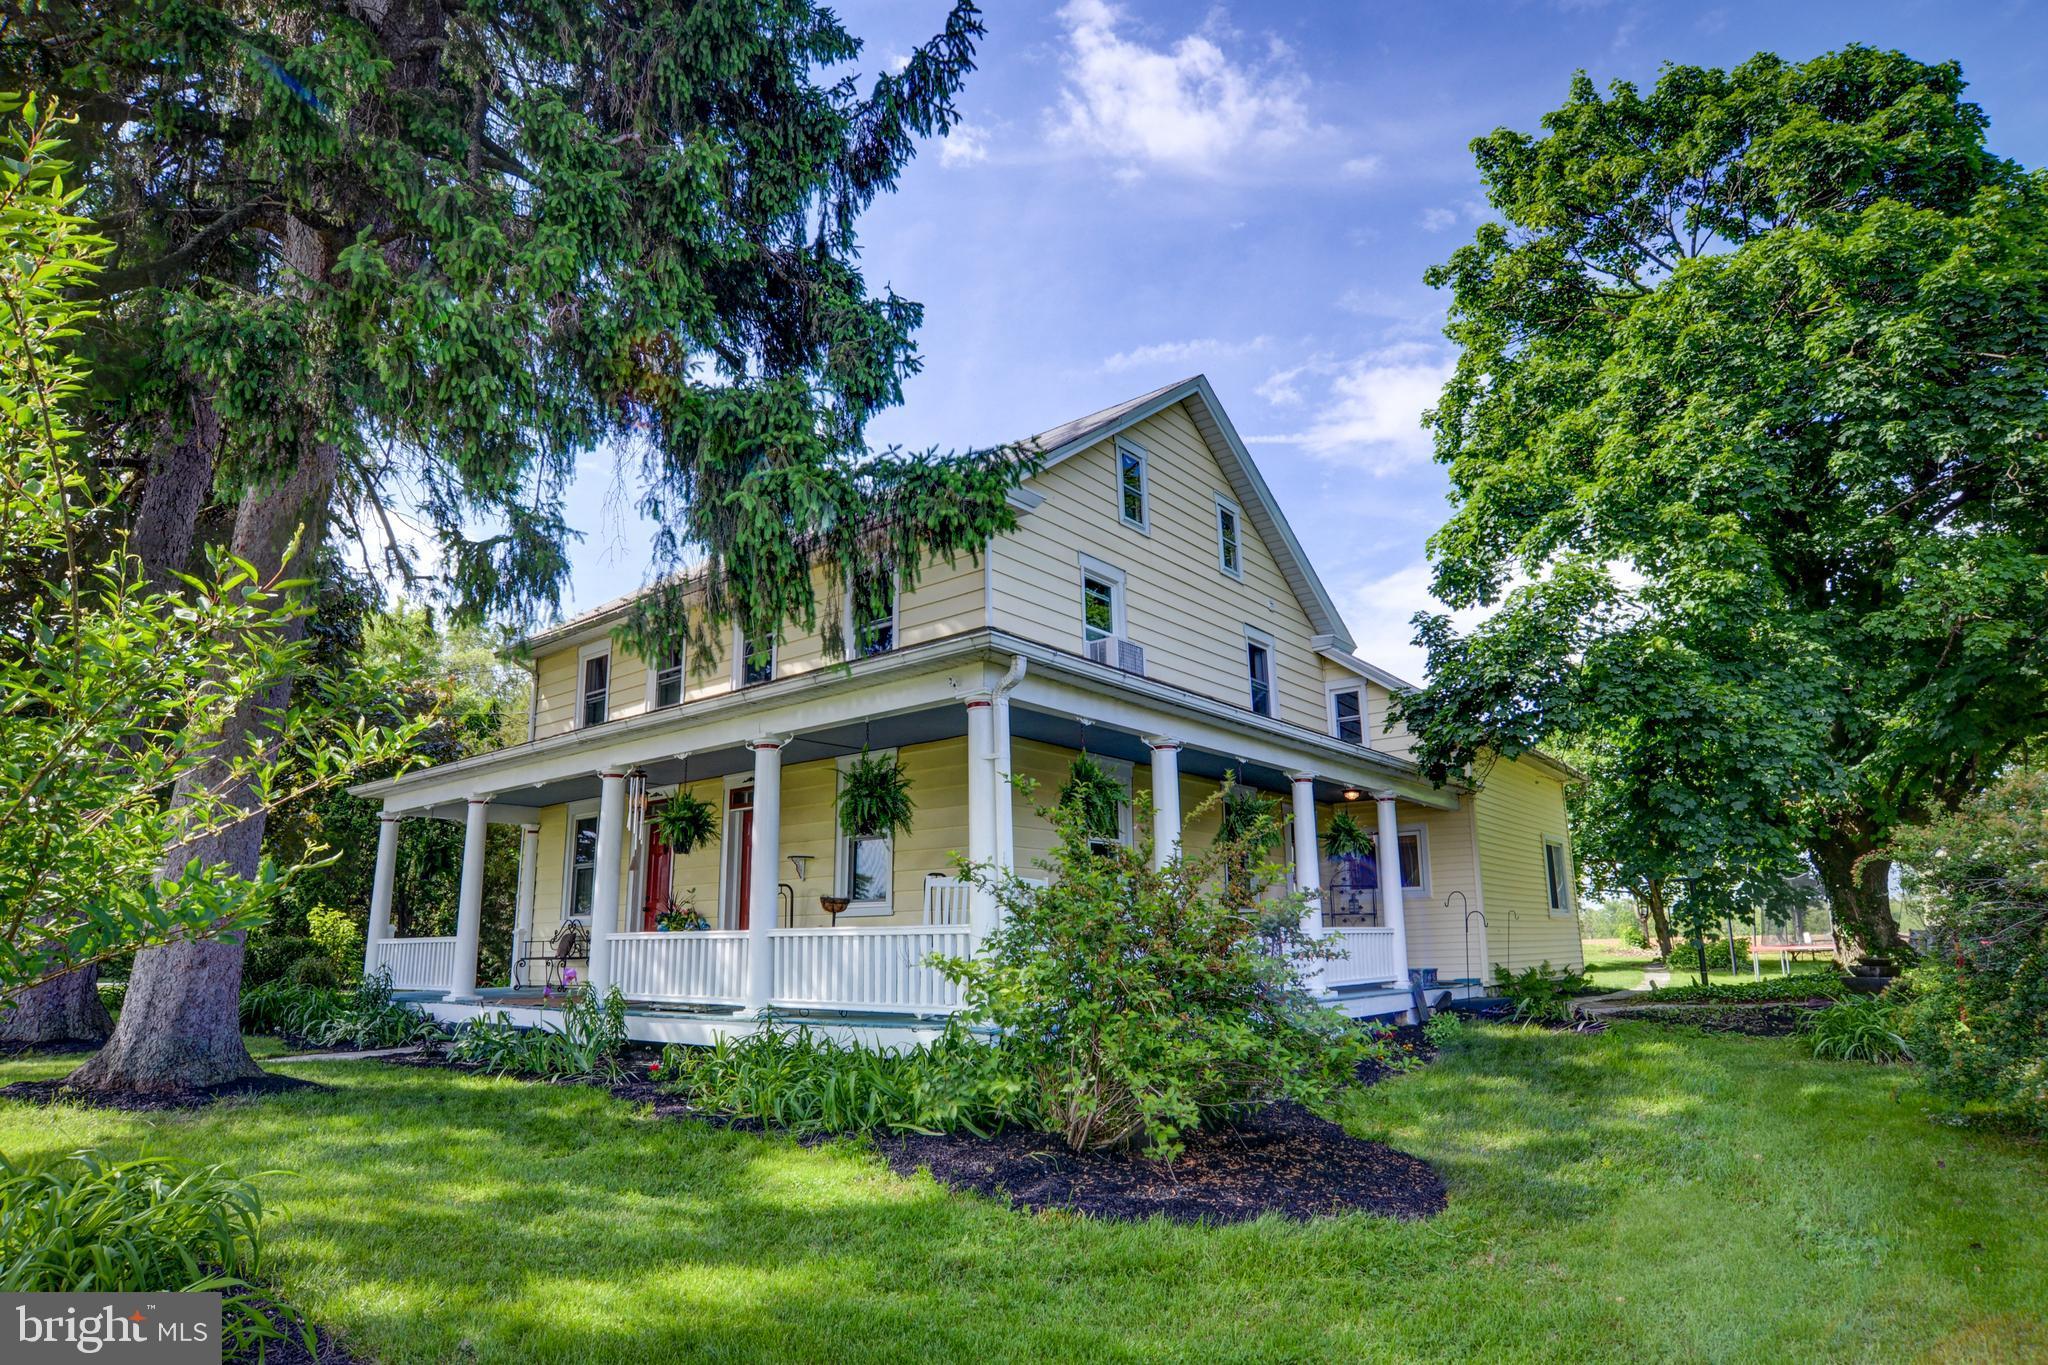 Residential for sale in MANHEIM, Pennsylvania, PALA133300